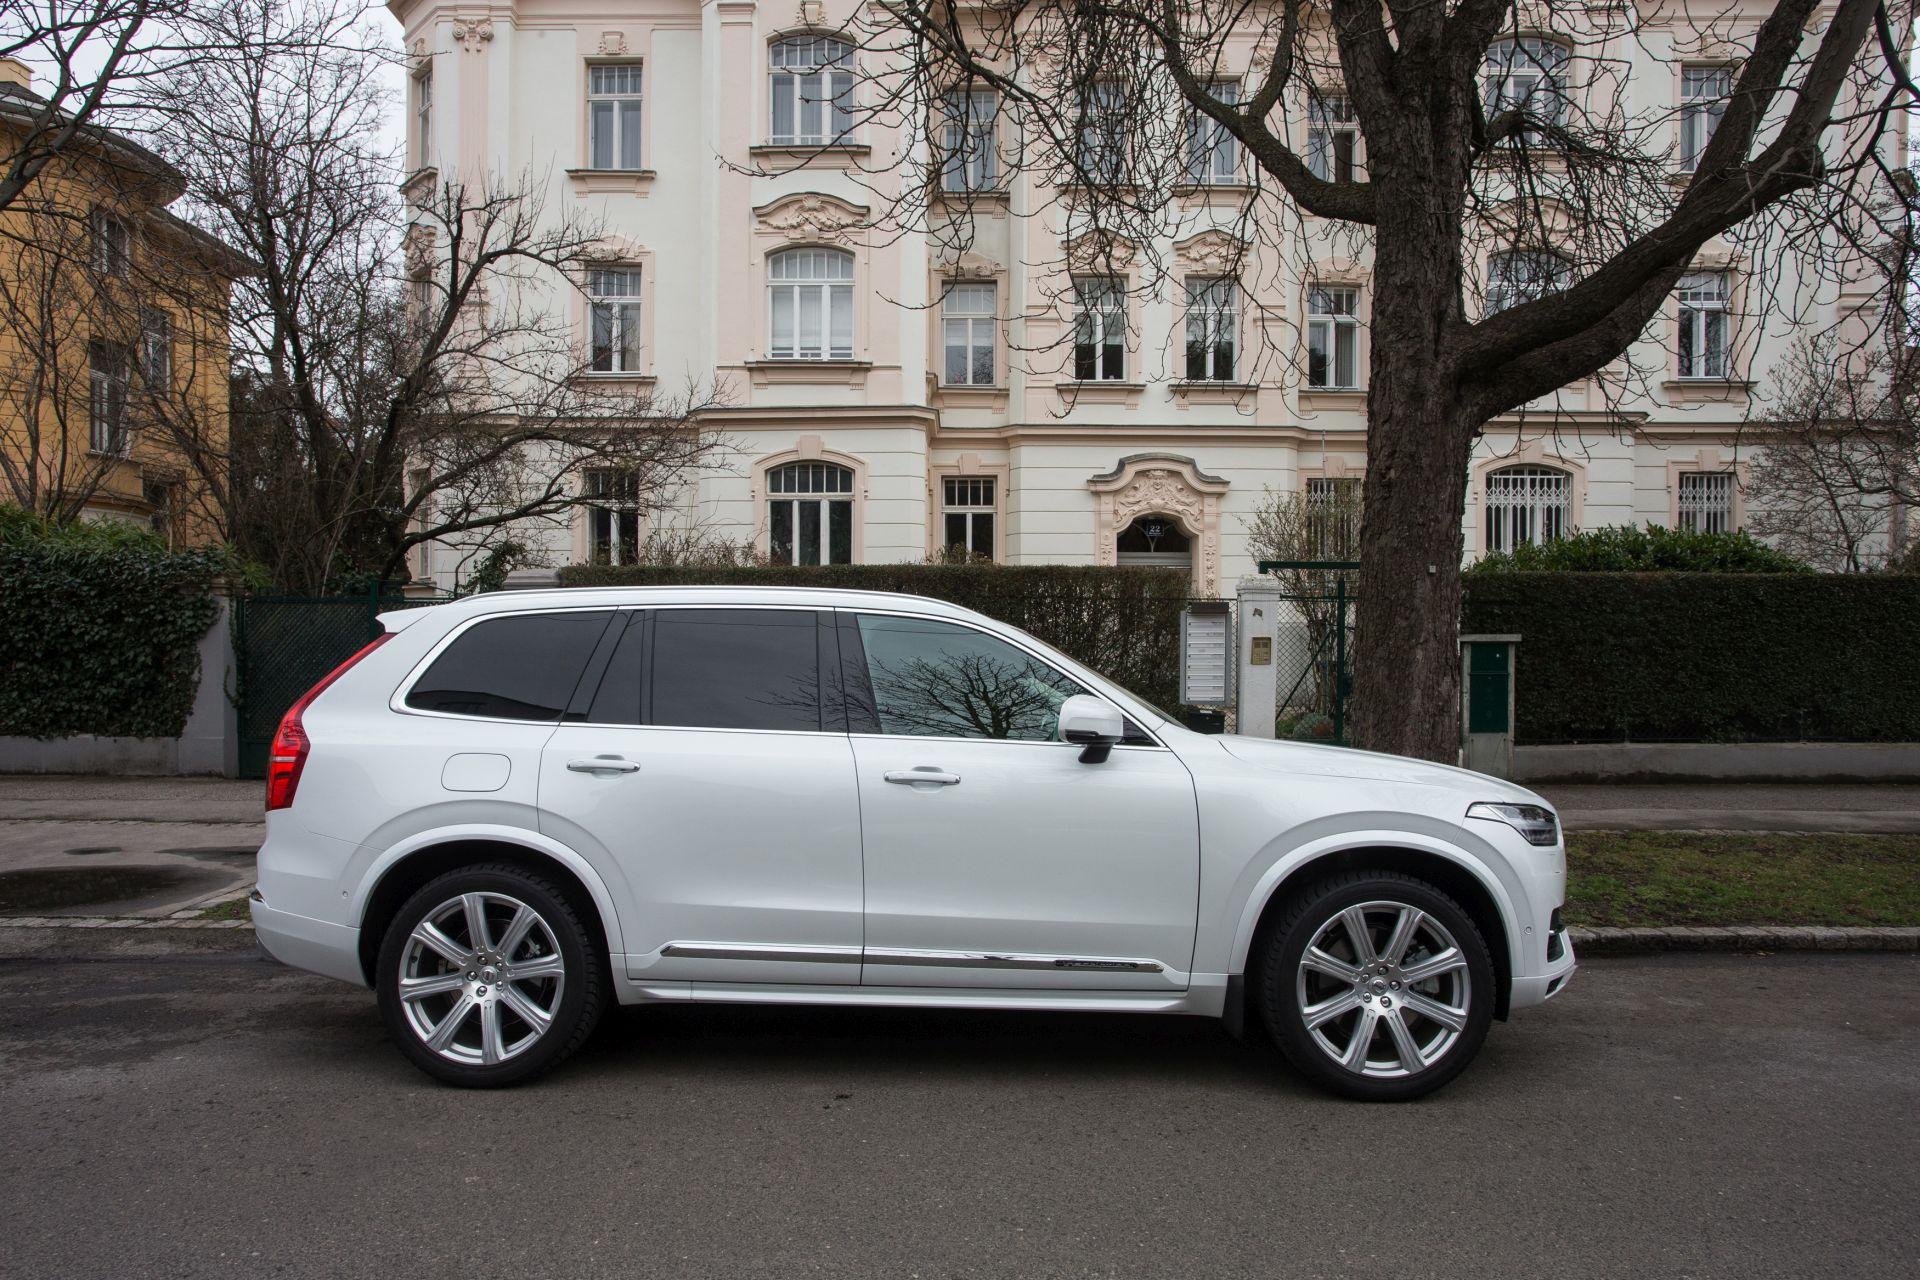 Volvo xc 90 test